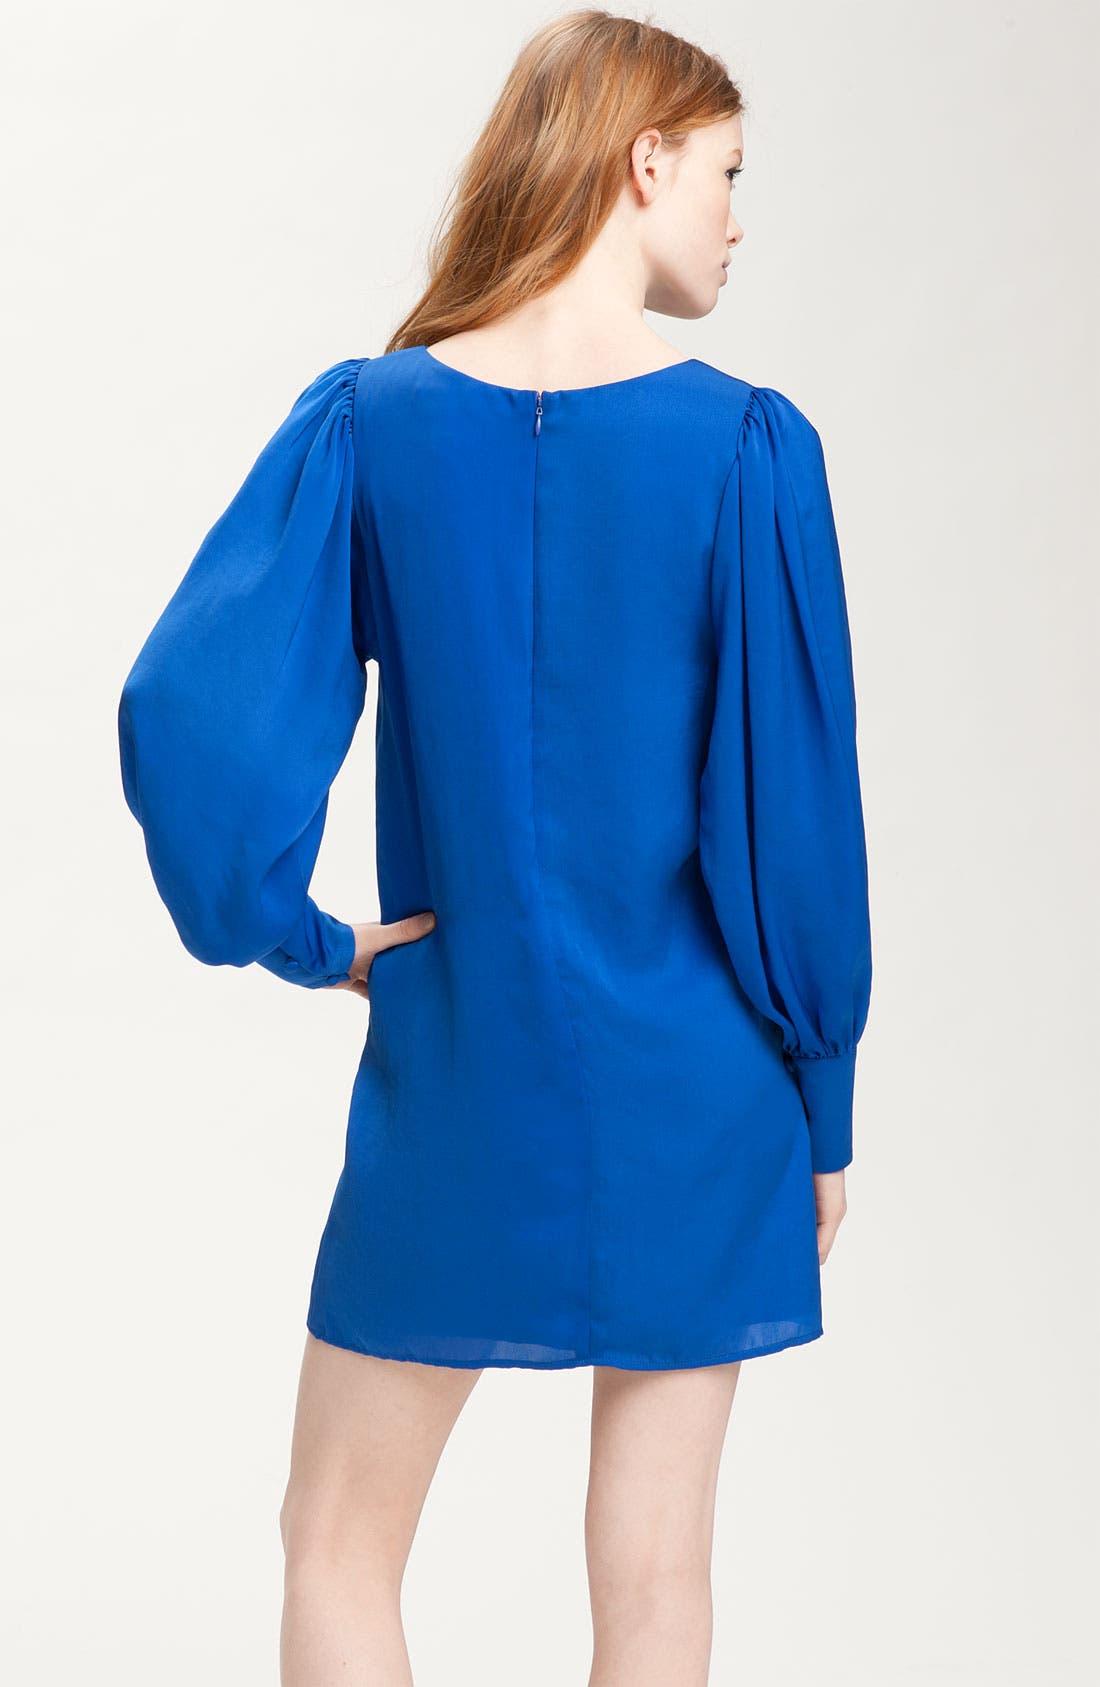 Alternate Image 2  - Rory Beca 'Juliette' Gathered Sleeve Shift Dress